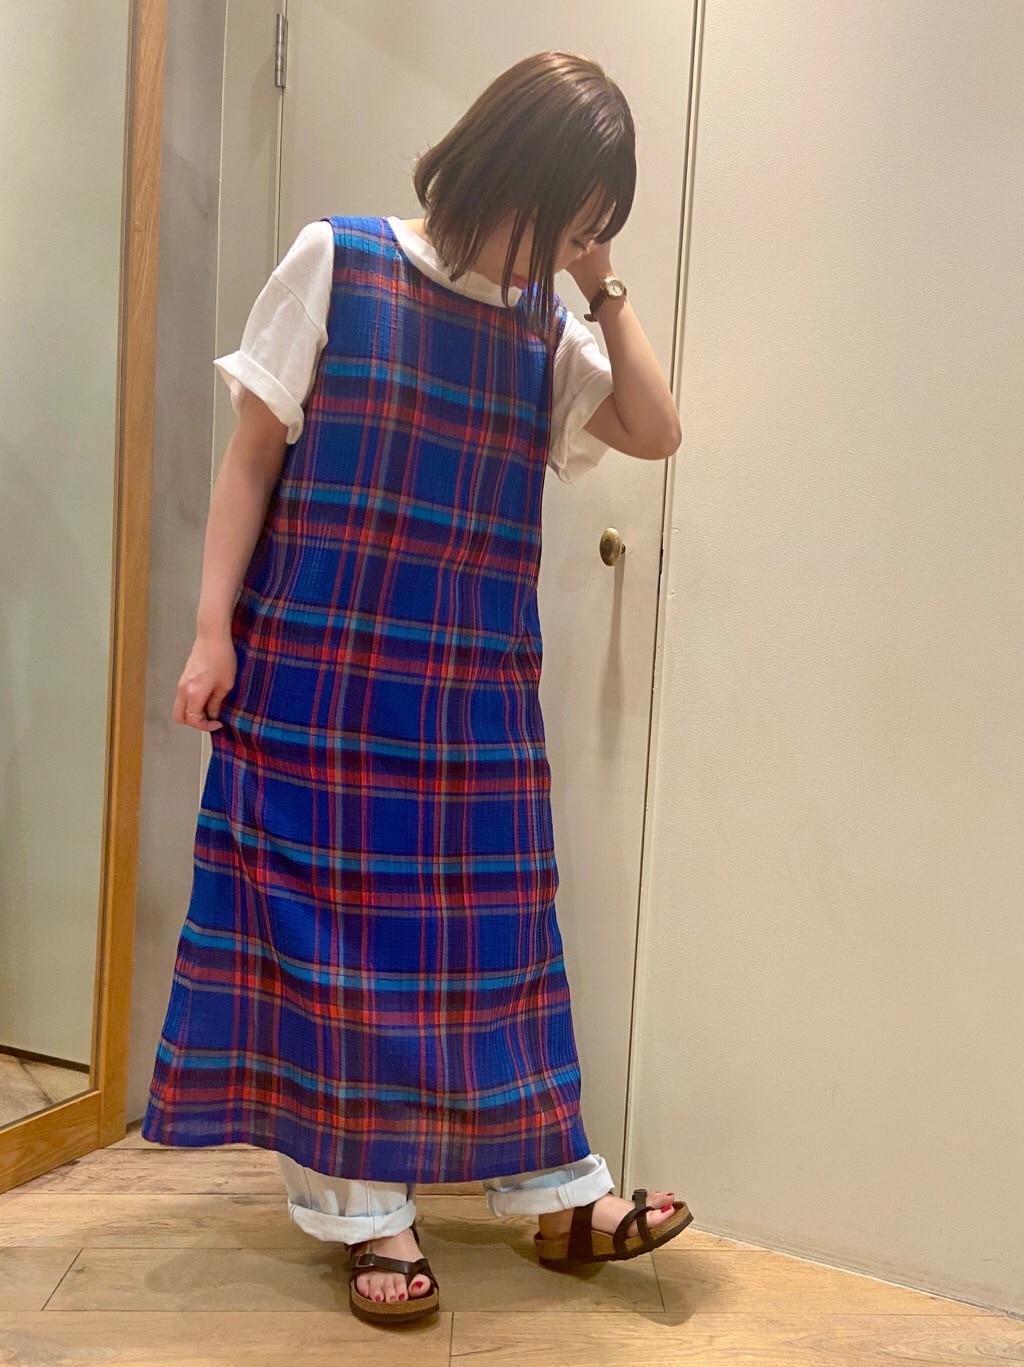 bulle de savon 新宿ミロード 身長:157cm 2020.06.05